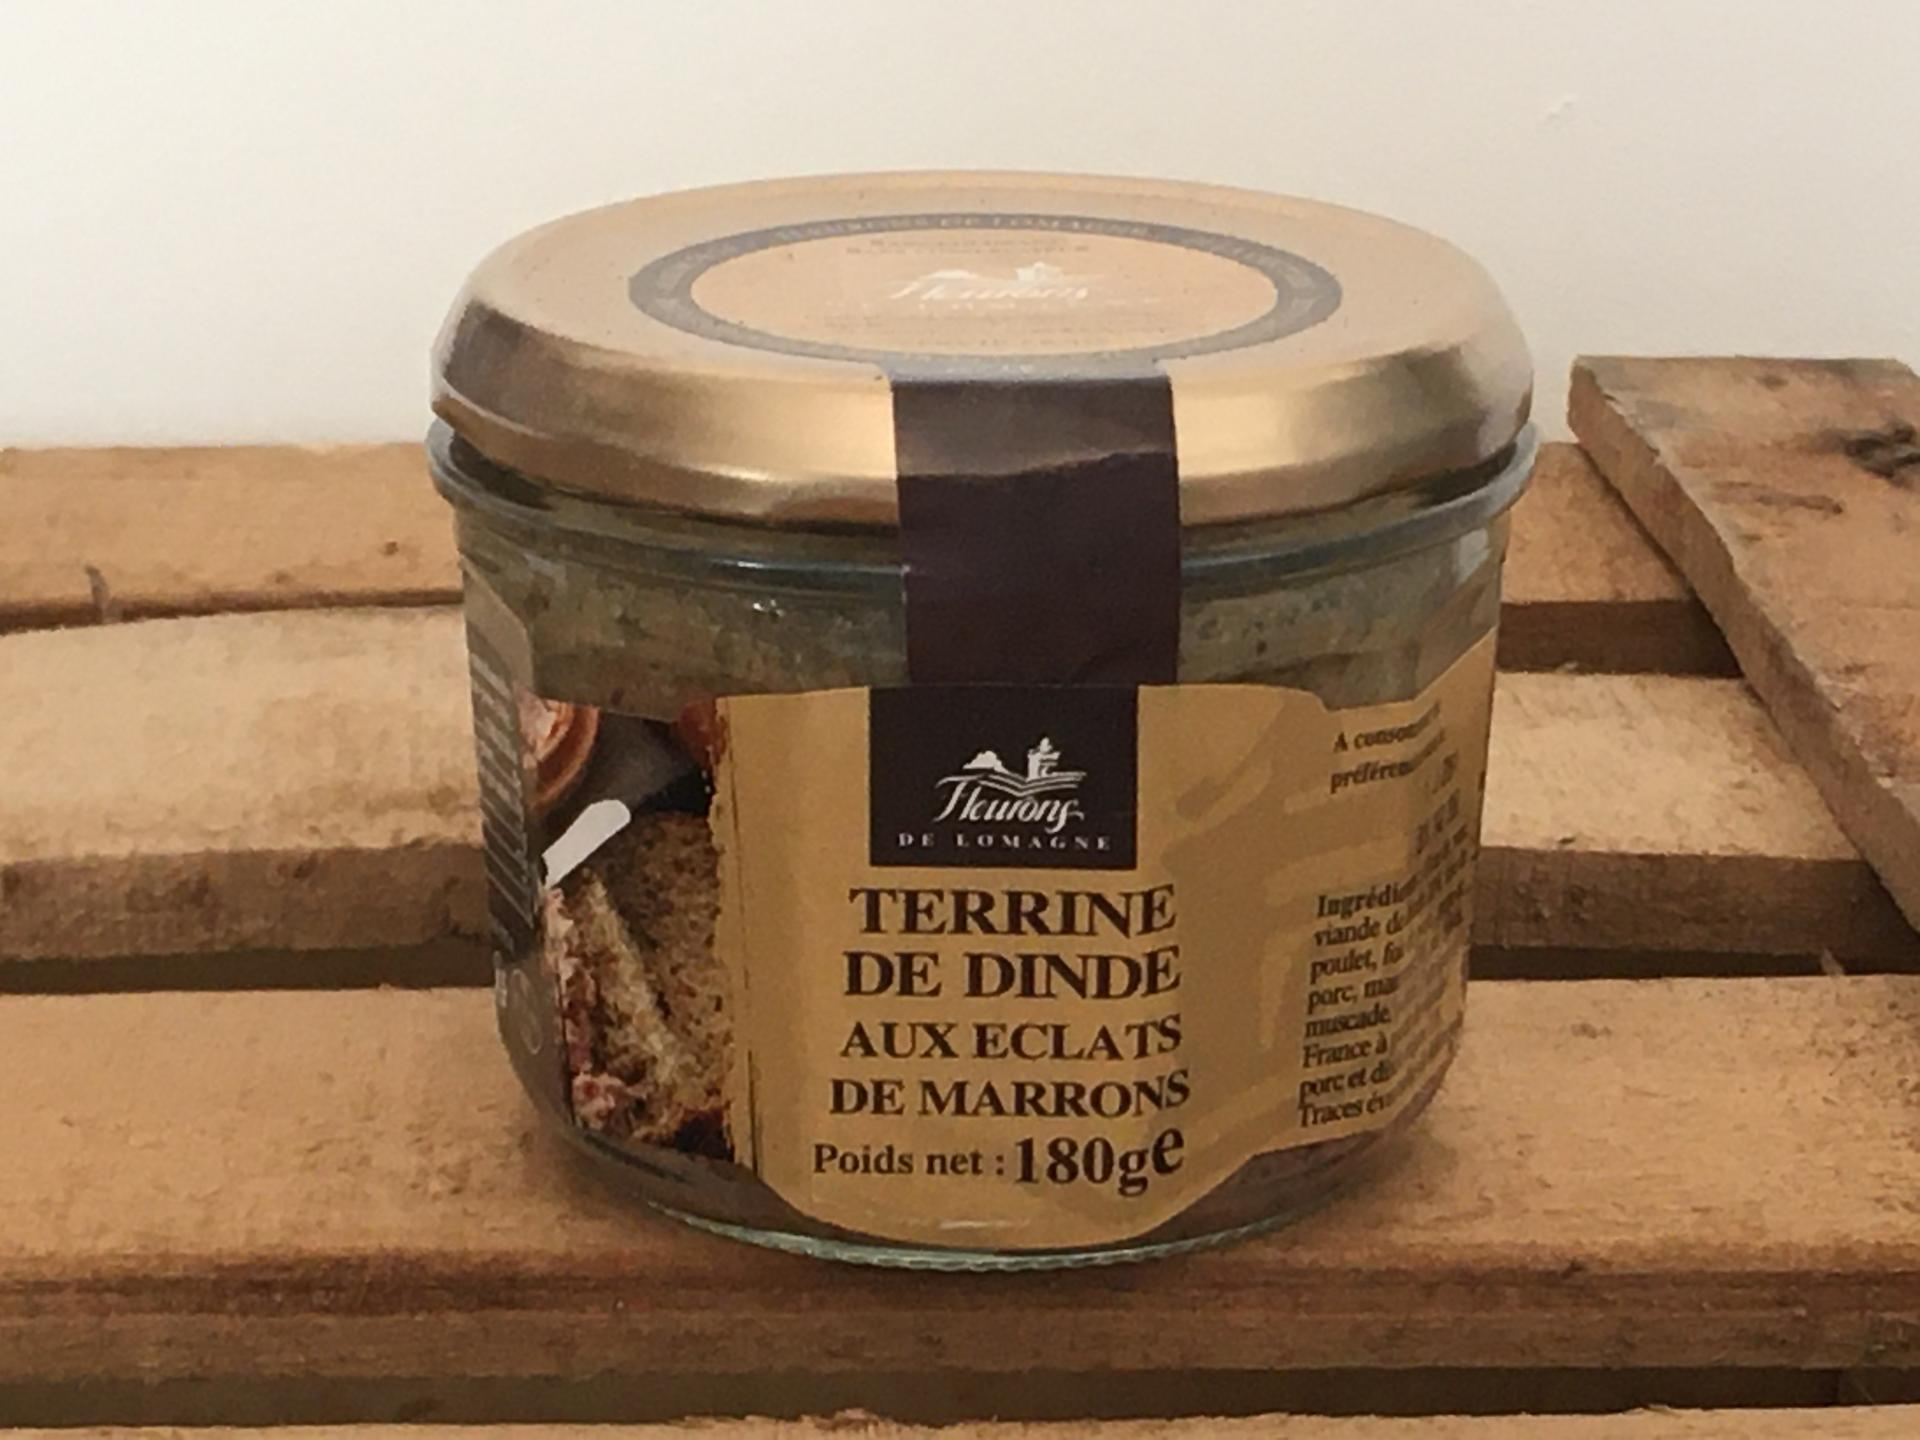 Terrine de dinde aux eclats de marrons 180g bocal